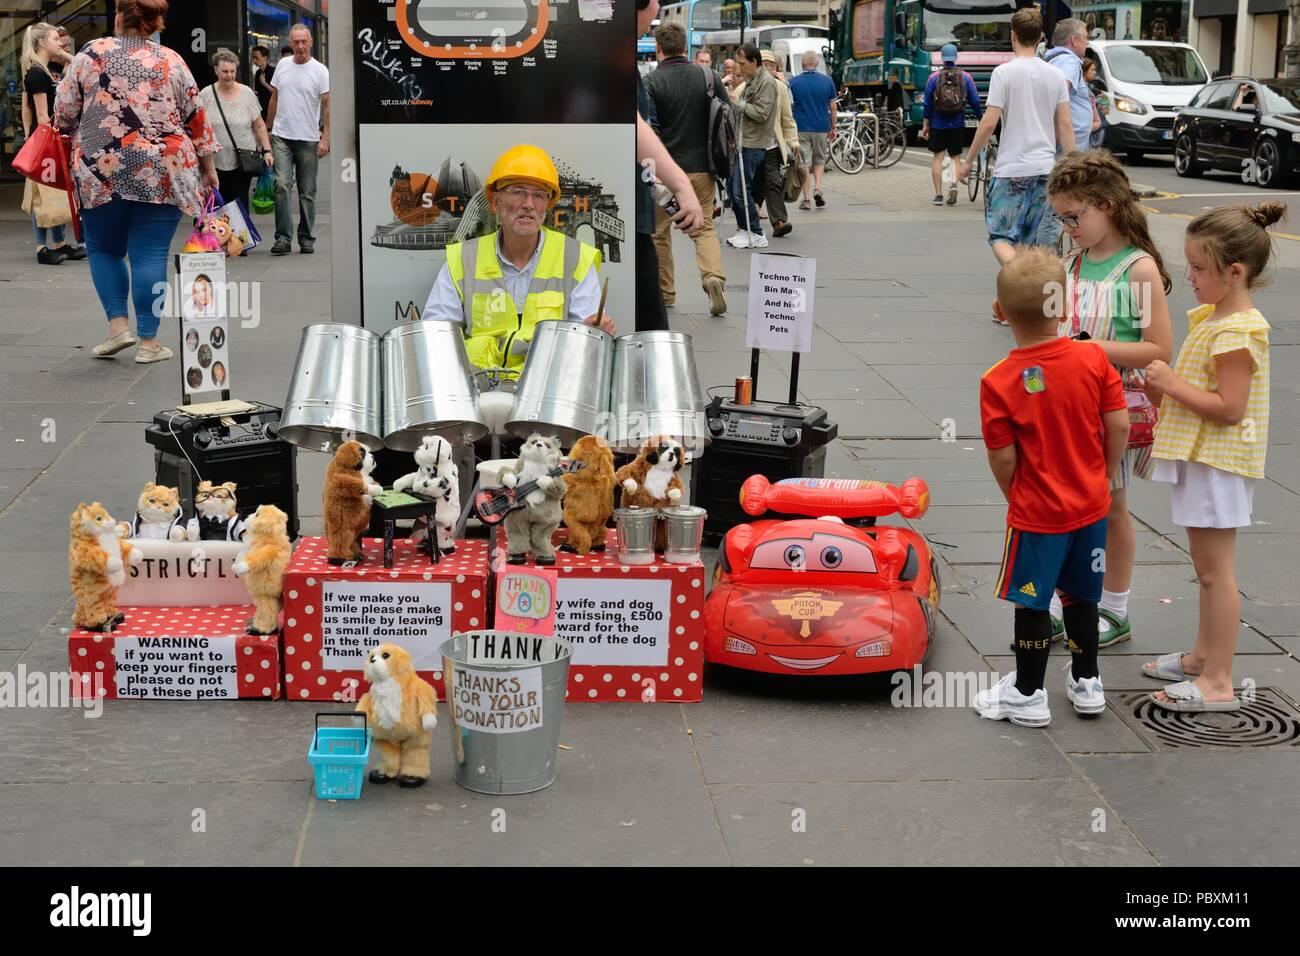 Children being entertained by the Techno Tin Bin Man busking on Argyle Street, Glasgow city centre, Scotland, UK - Stock Image